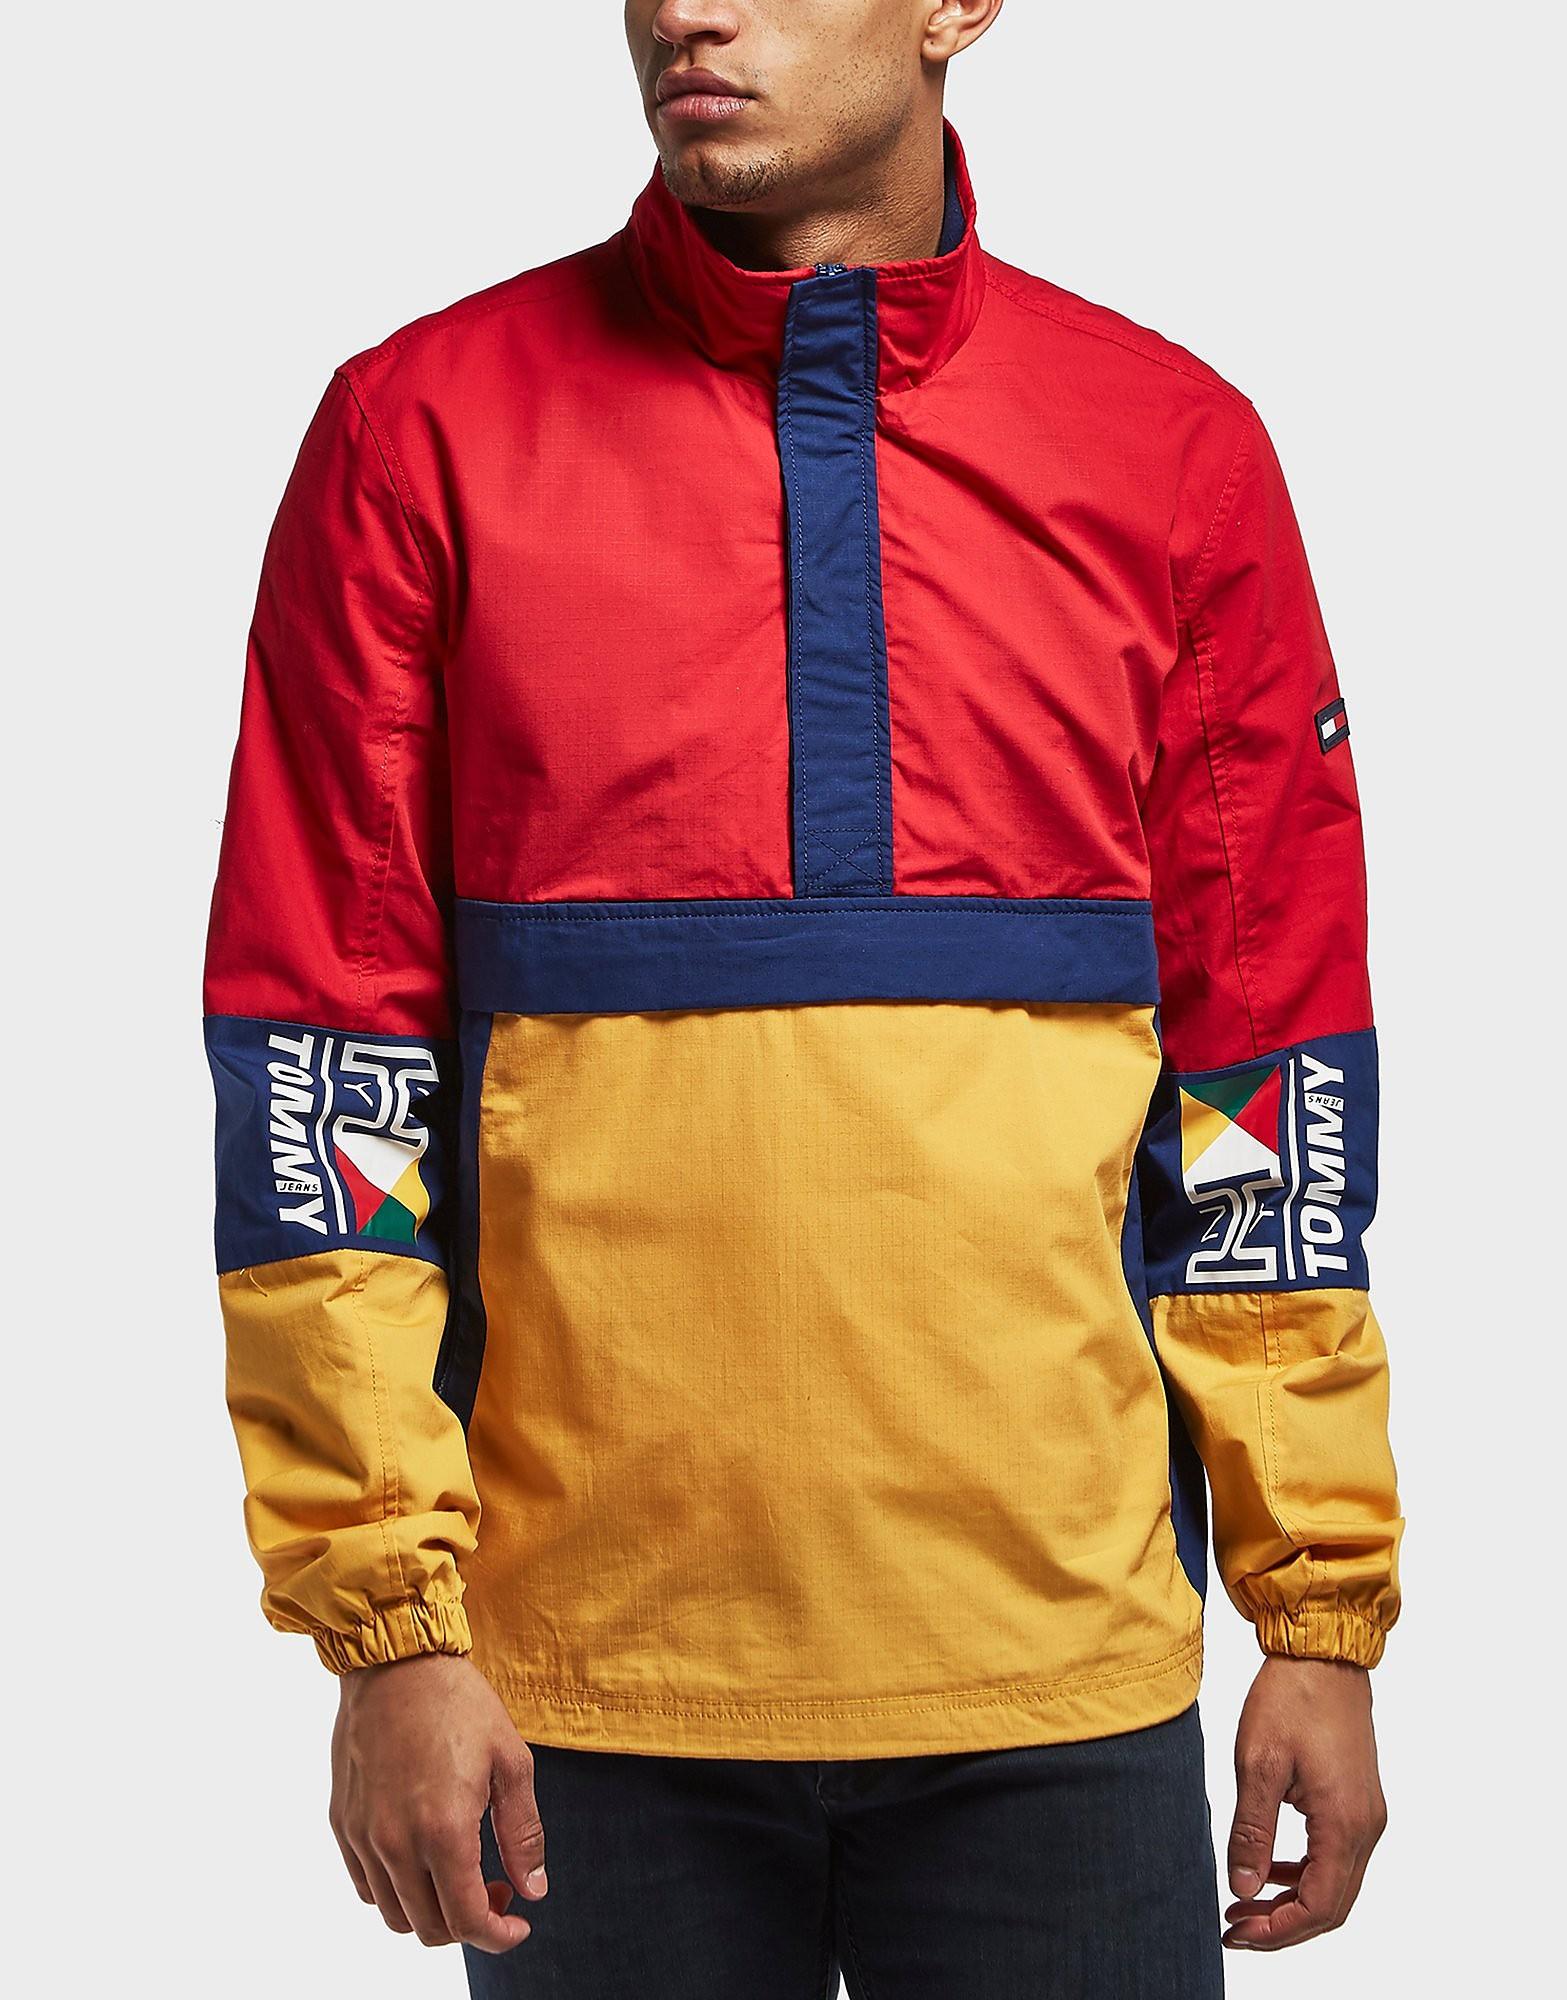 Tommy Hilfiger Retro Block Overhead Light Jacket